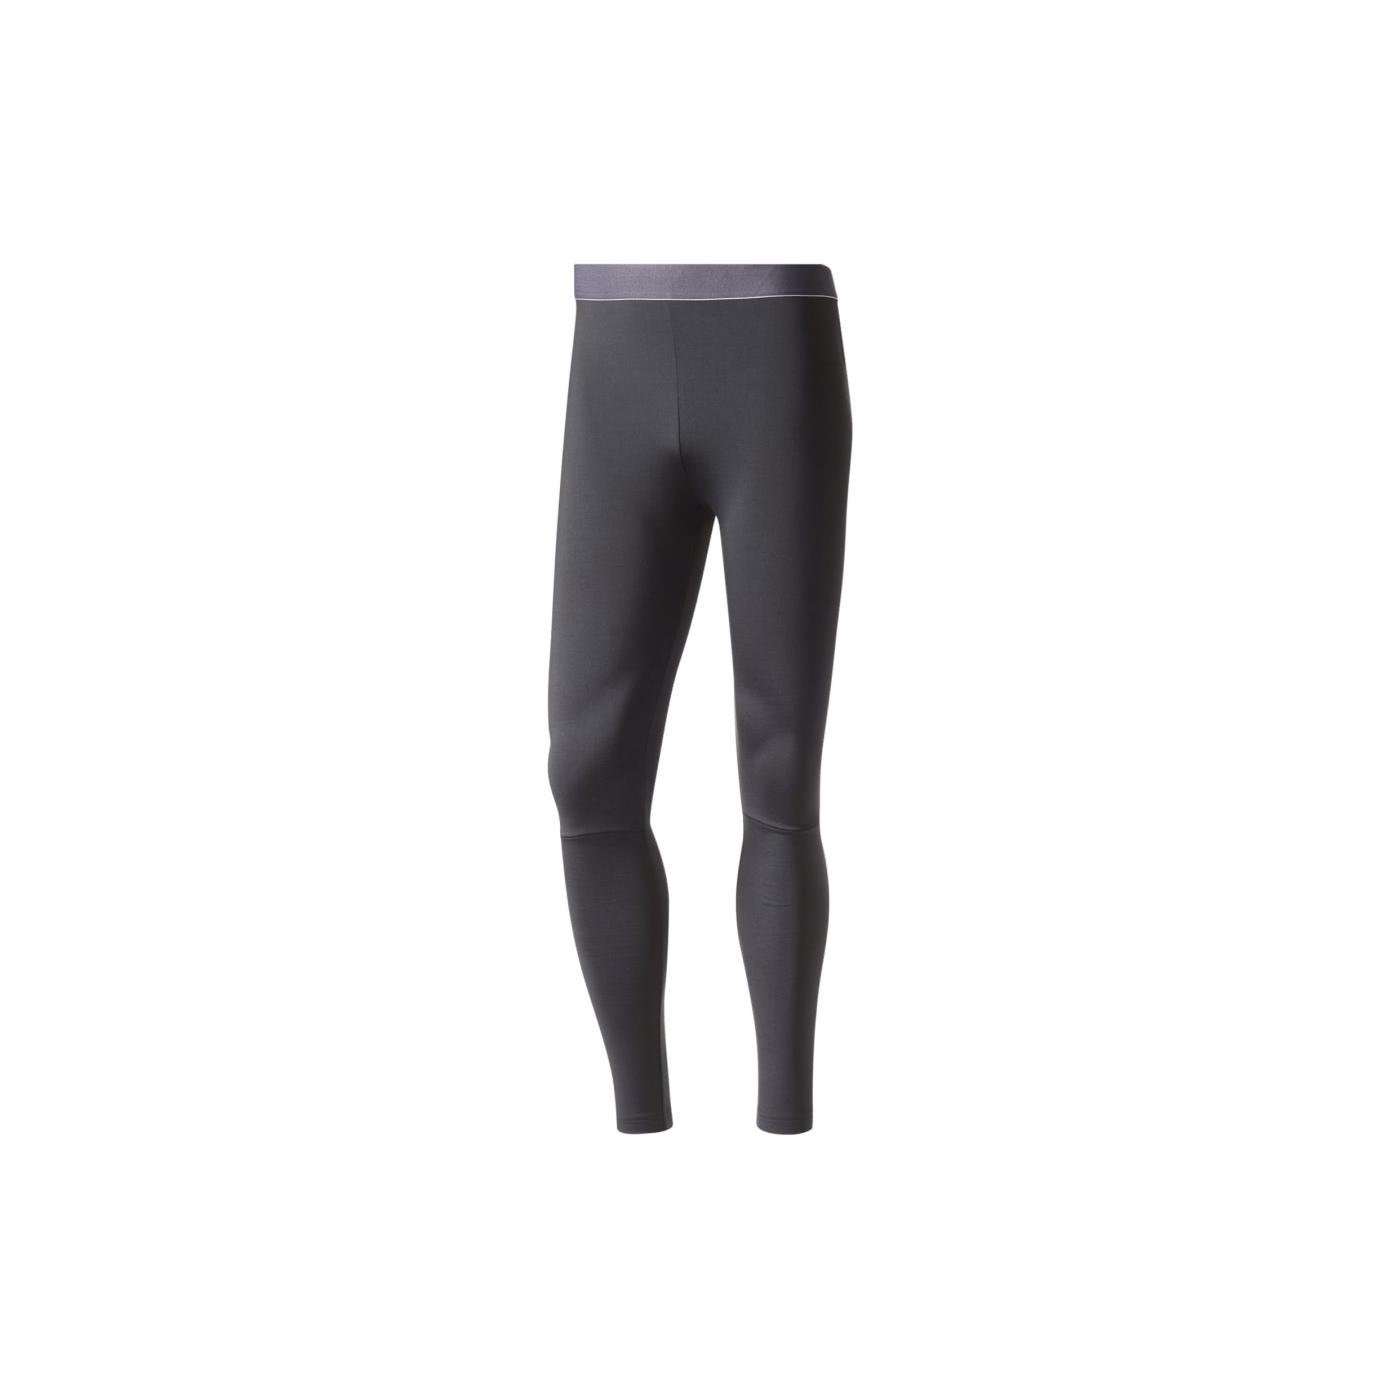 Collant Running Trail Adidas Xperior Tights M Noir  3de2362ce41